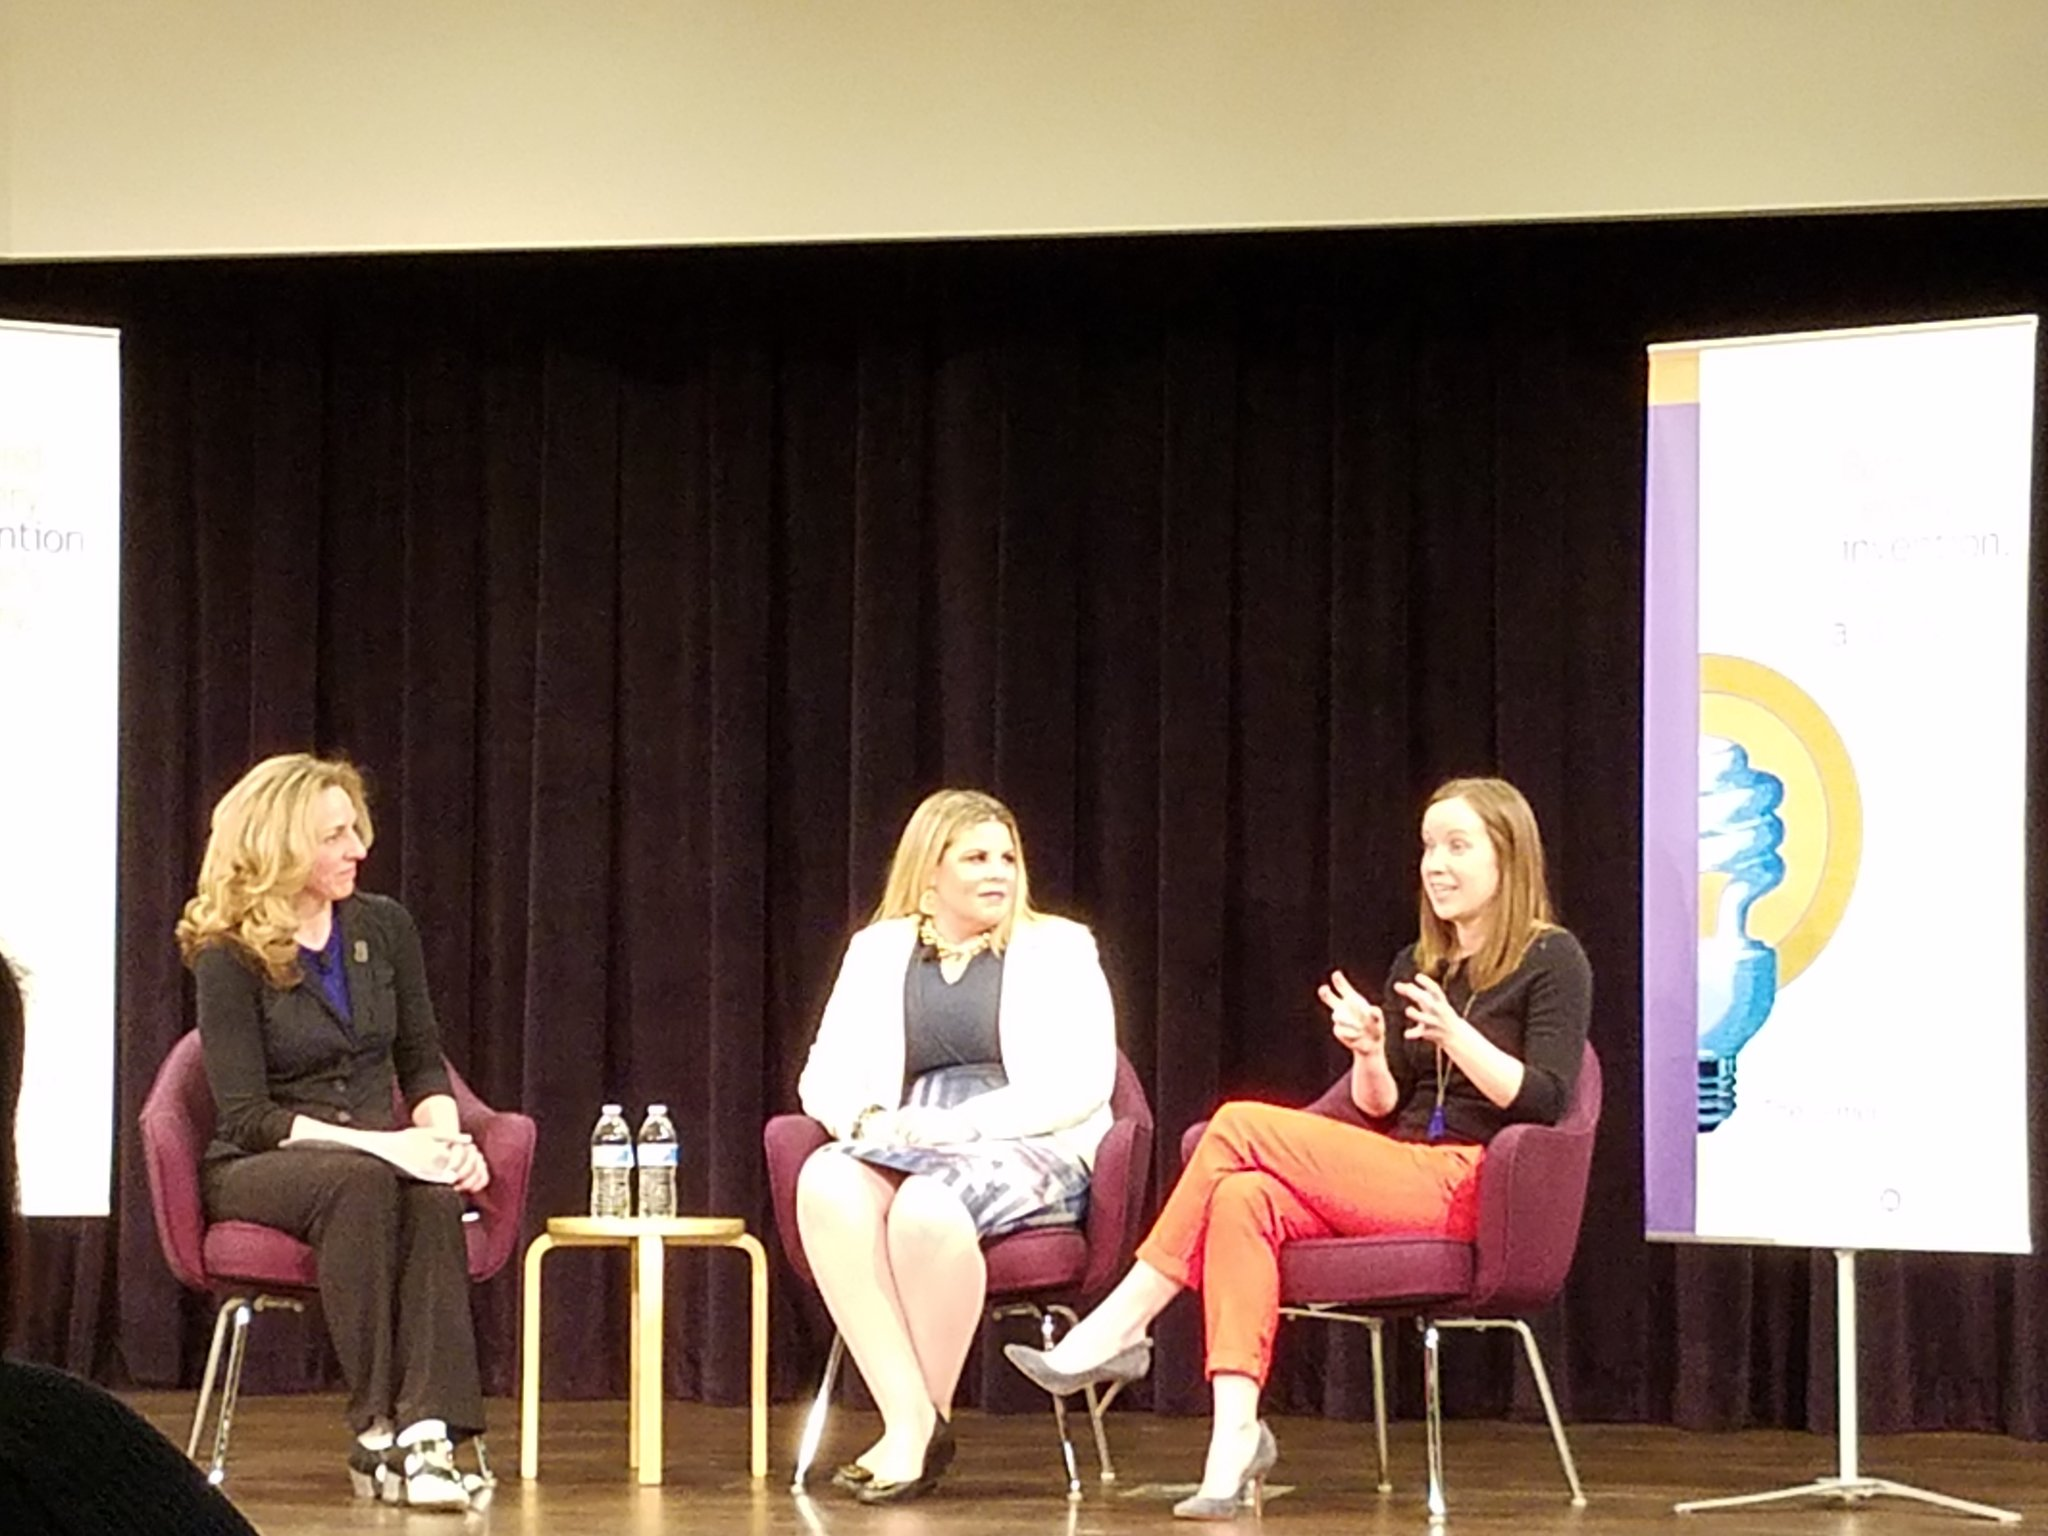 @SI_Invention lecture w/ @SusannahFox @MakerNurse & @NightingaleApps on #nursing, #innovation, & #digitalhealth https://t.co/WalZyk24Ln